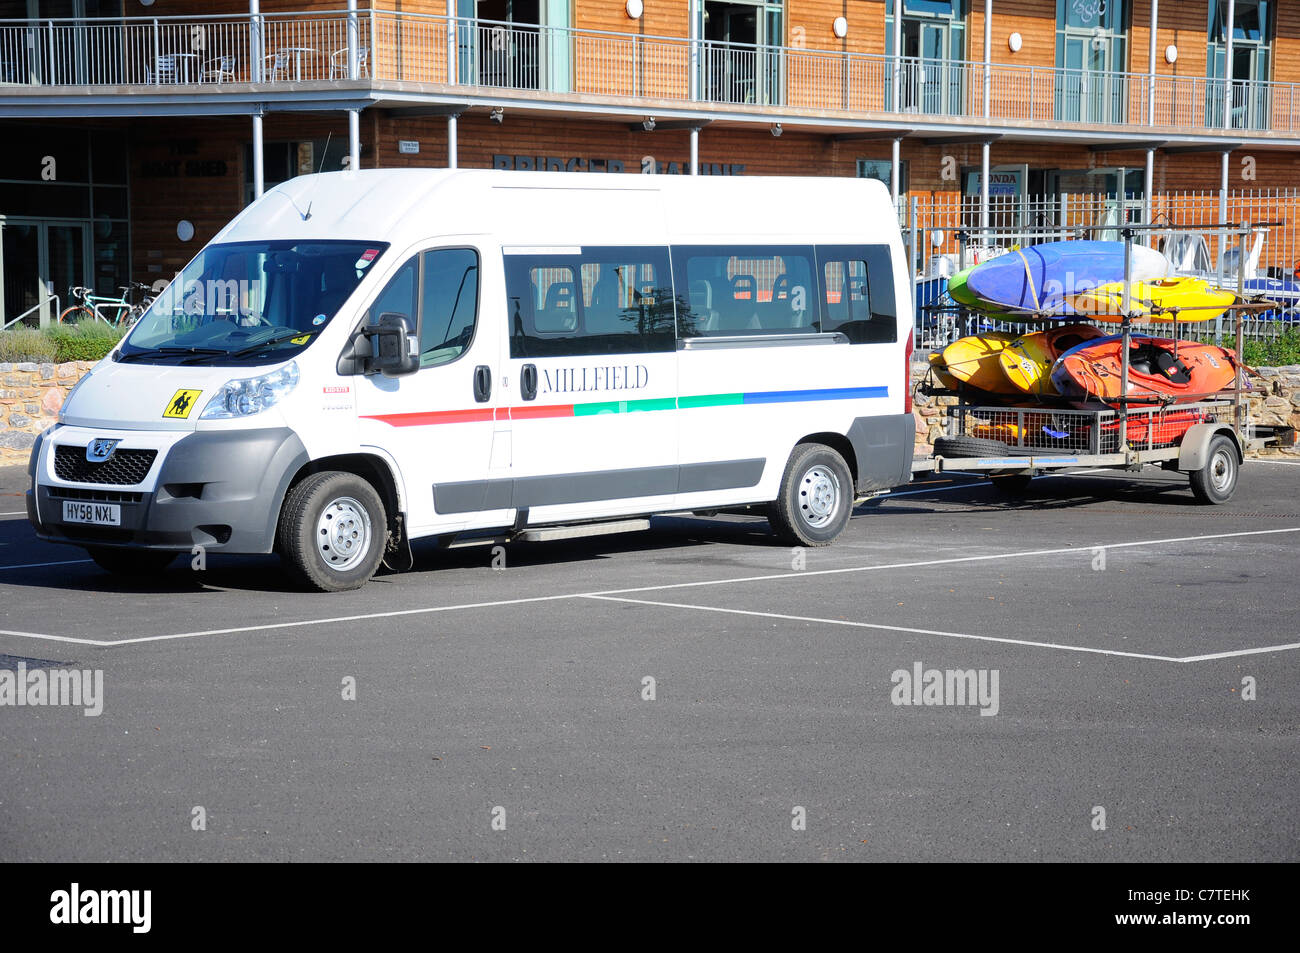 Millfield School minibus on an adventure education outdoor pursuits trip. - Stock Image